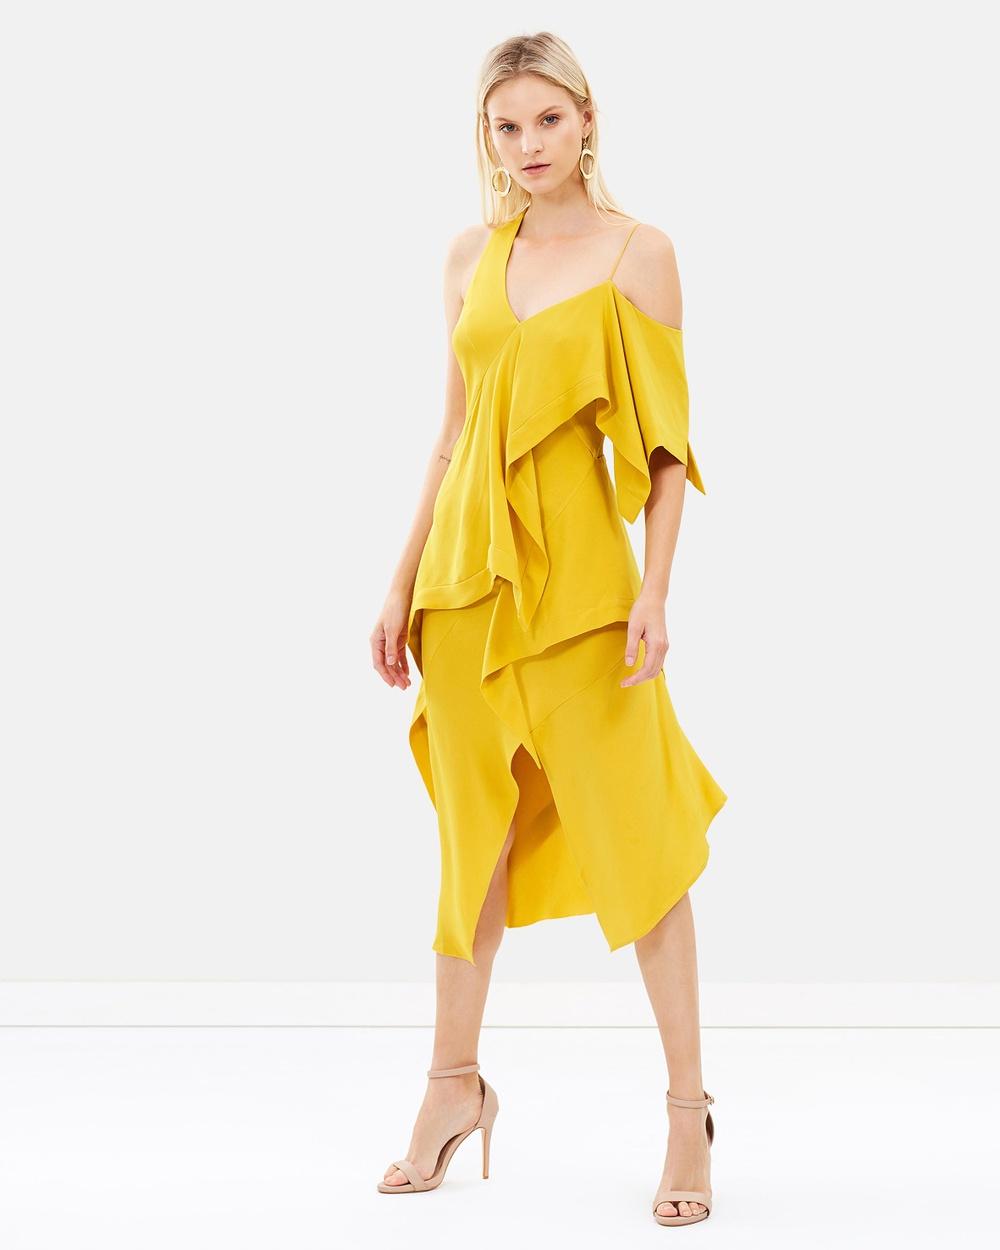 KITX Diversity Spiral Dress Dresses Tumeric Diversity Spiral Dress